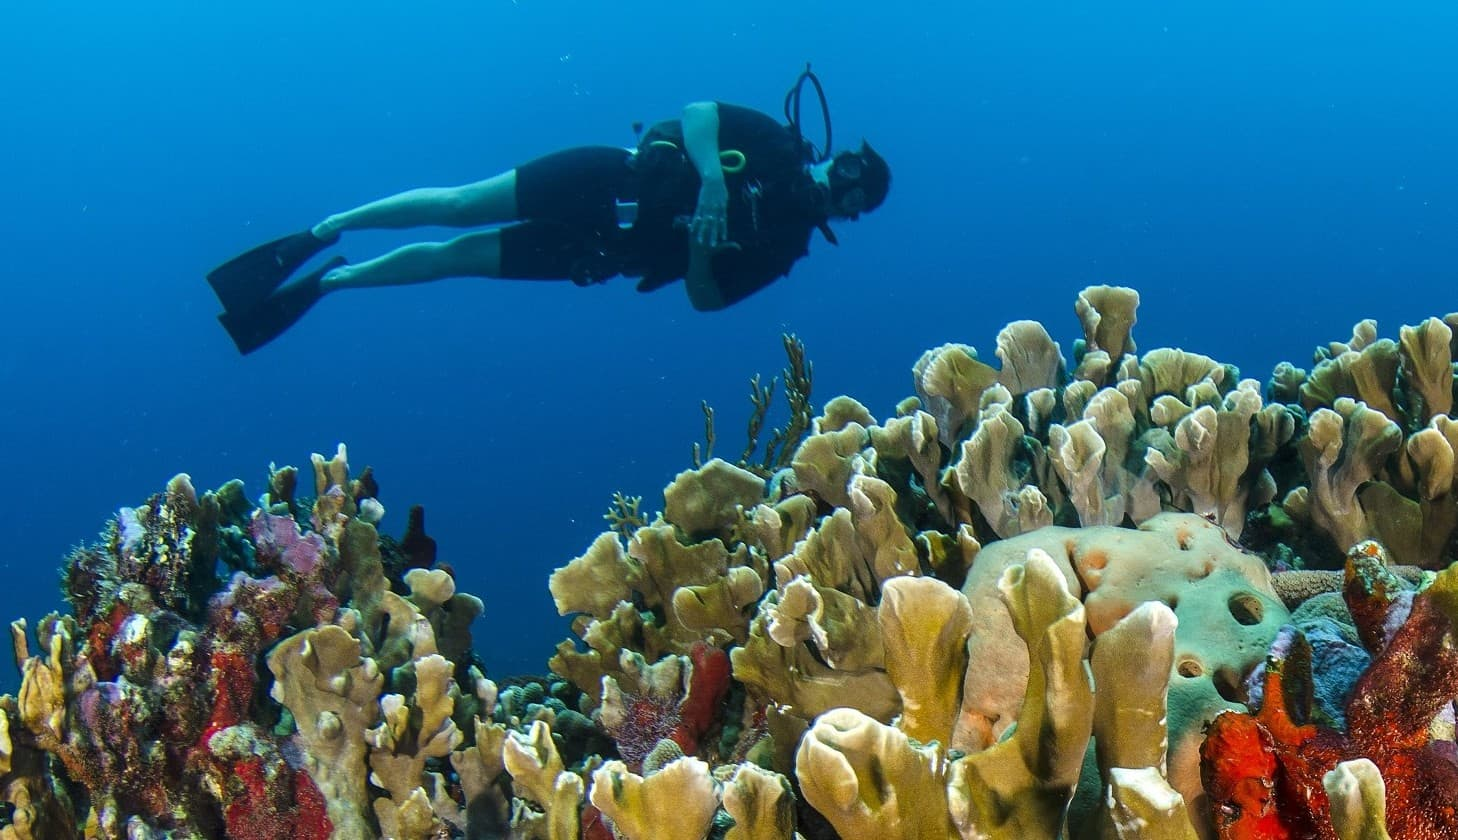 scuba diver next to coral reefs